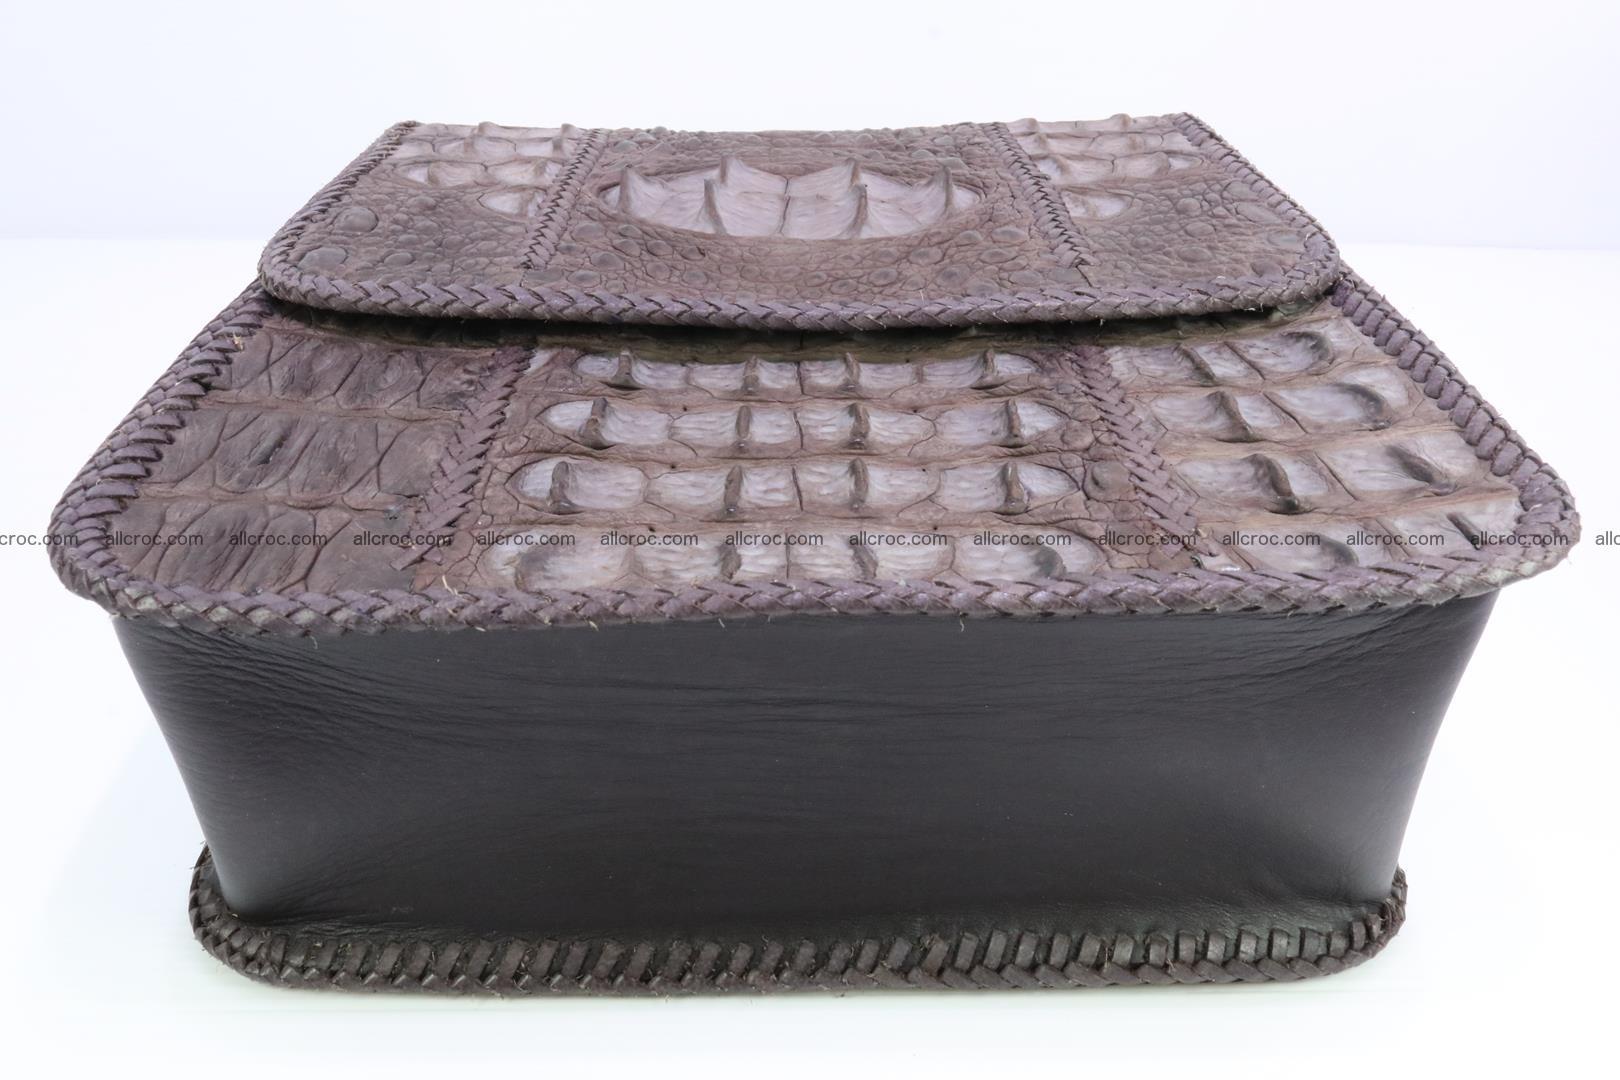 Сrocodile skin shoulder bag with braided edges 142 Foto 7